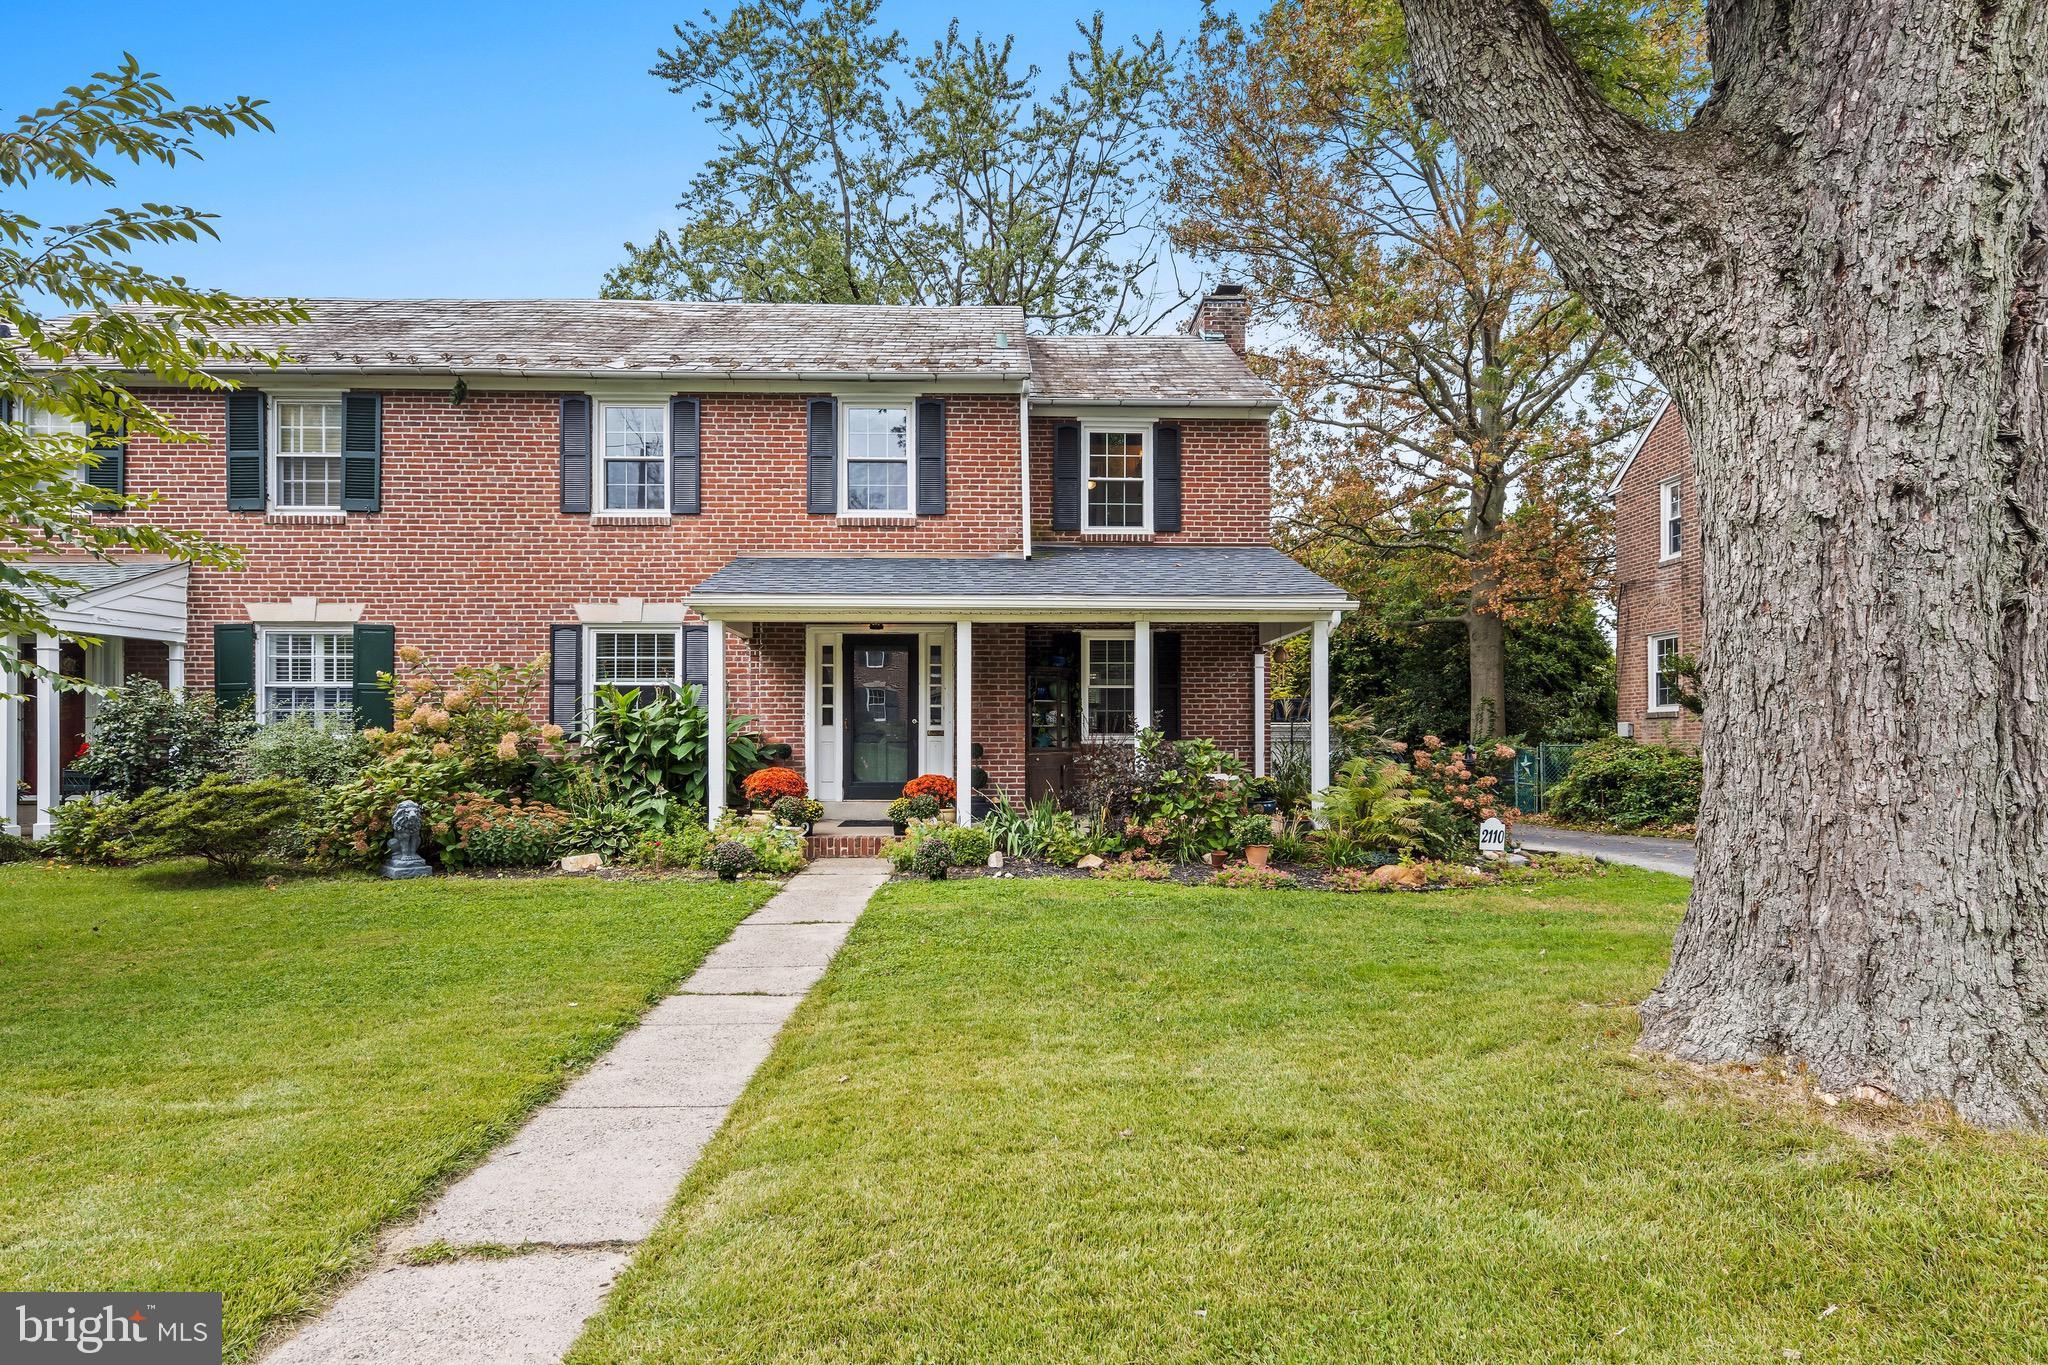 2110 Chestnut Avenue, Ardmore, PA 19003